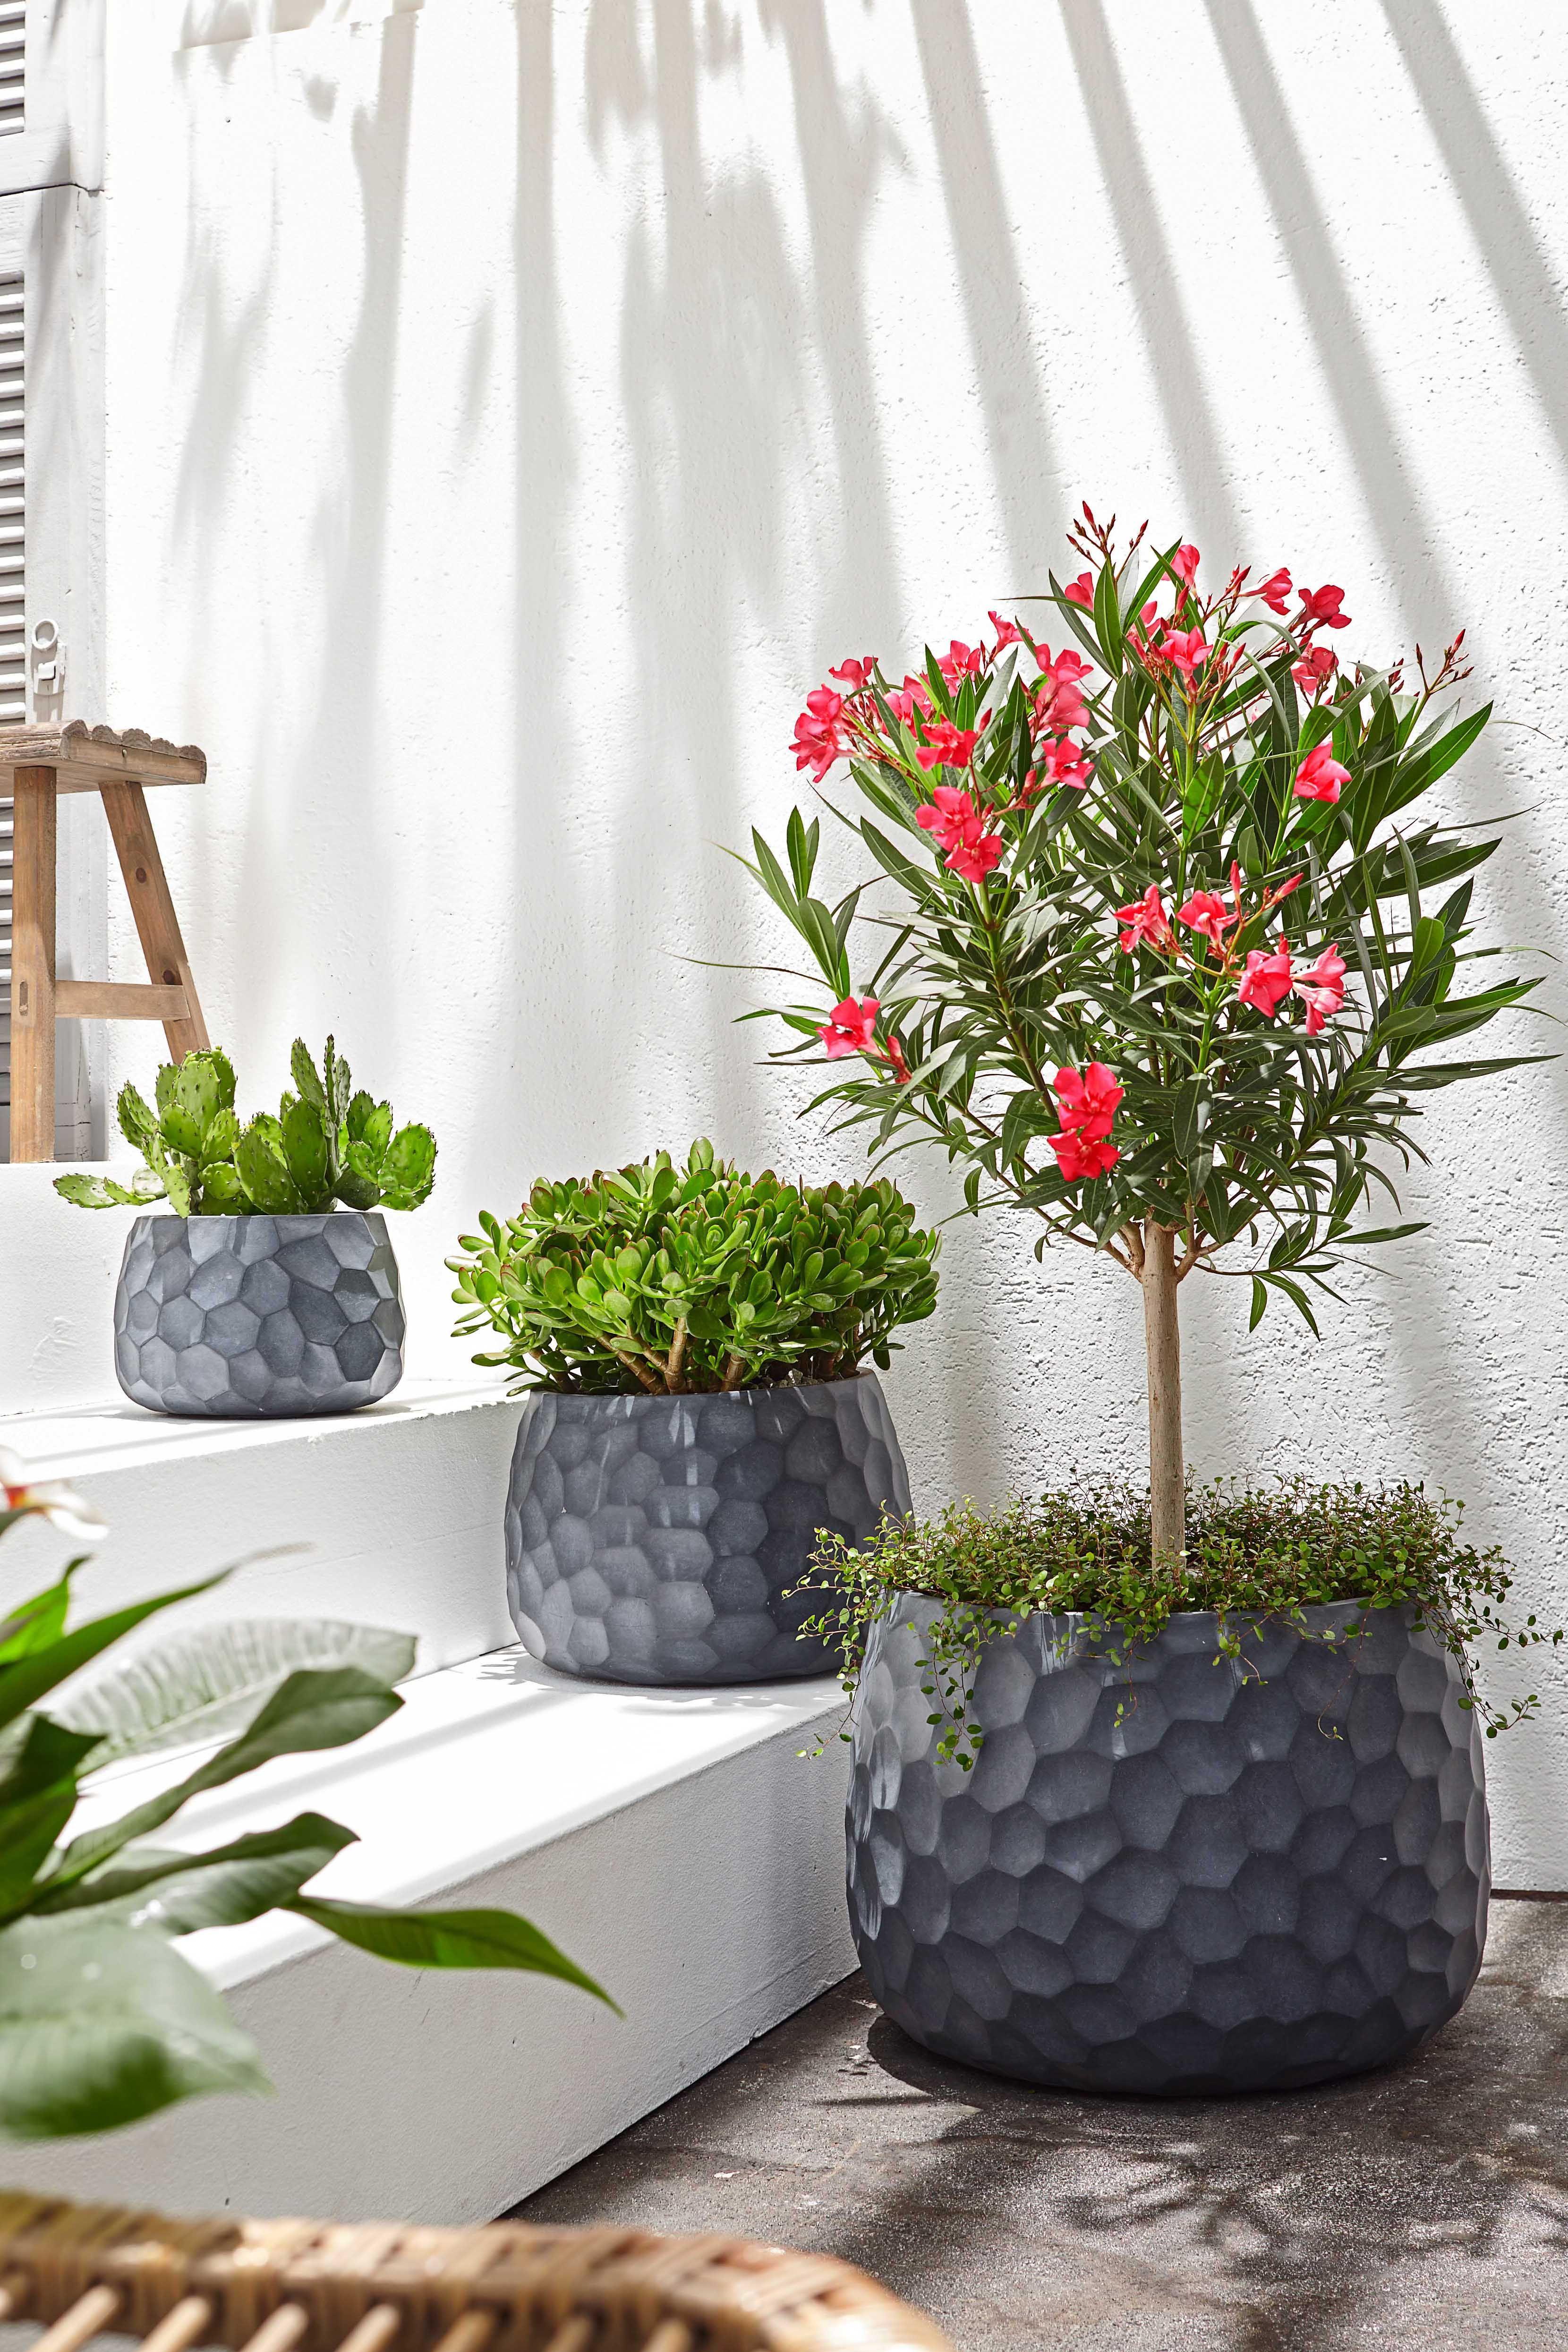 Oleander Pflanzen Dekor Gartendesign Ideen Topfpflanzen